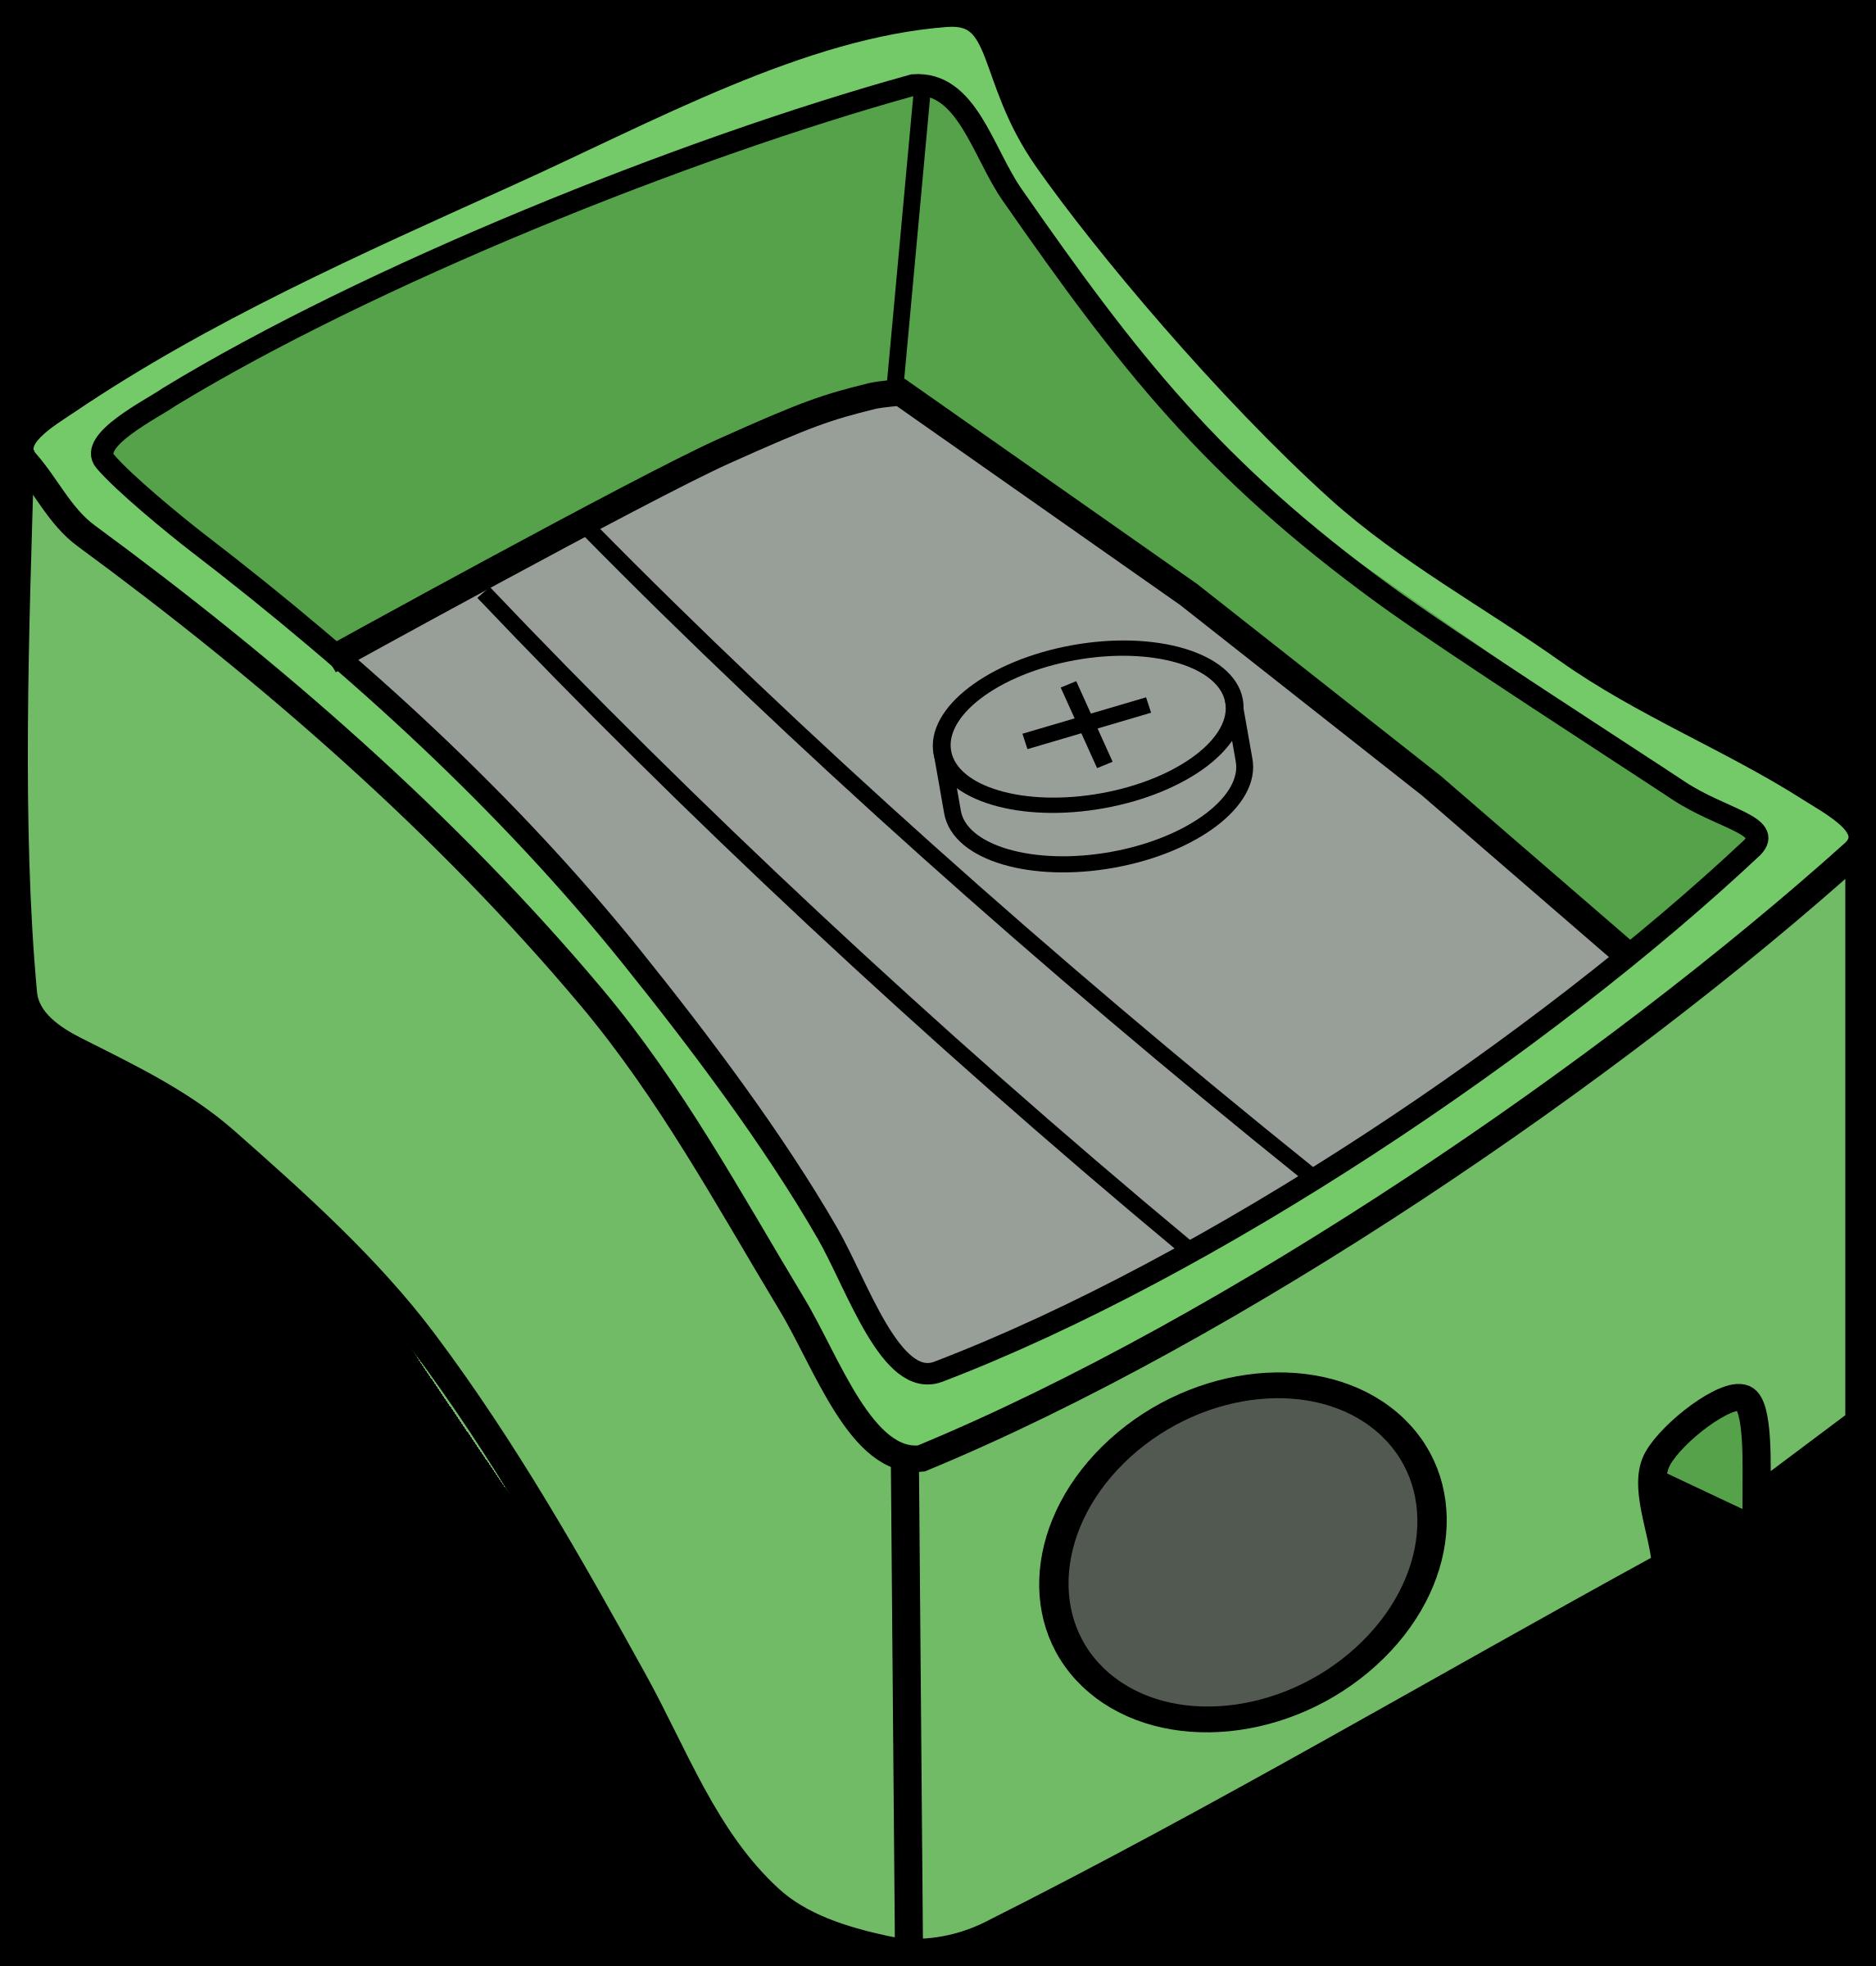 Clipart Pencil Sharpener.